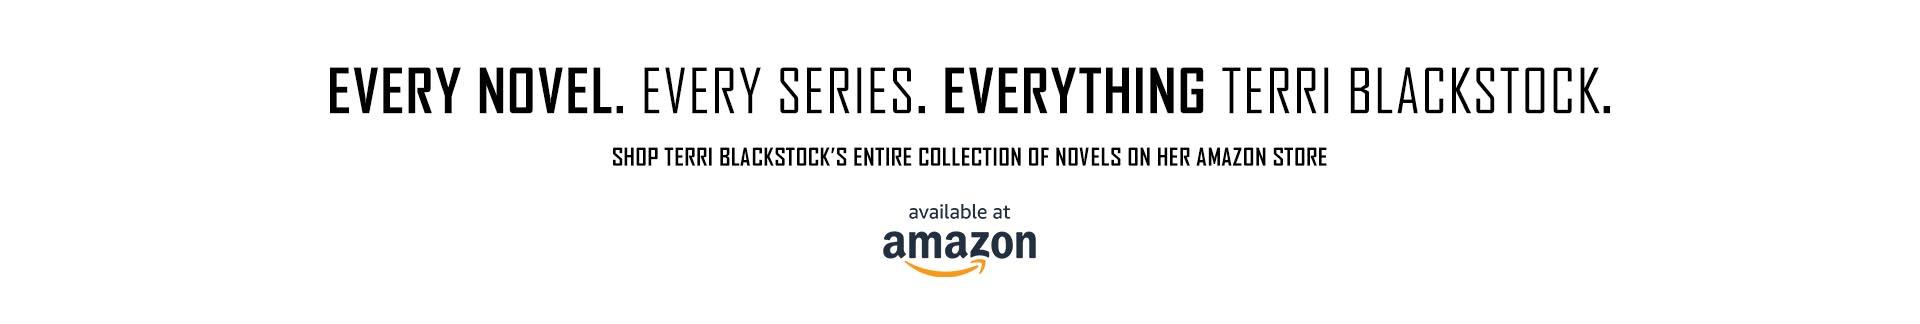 Terri Blackstock Amazon Collection